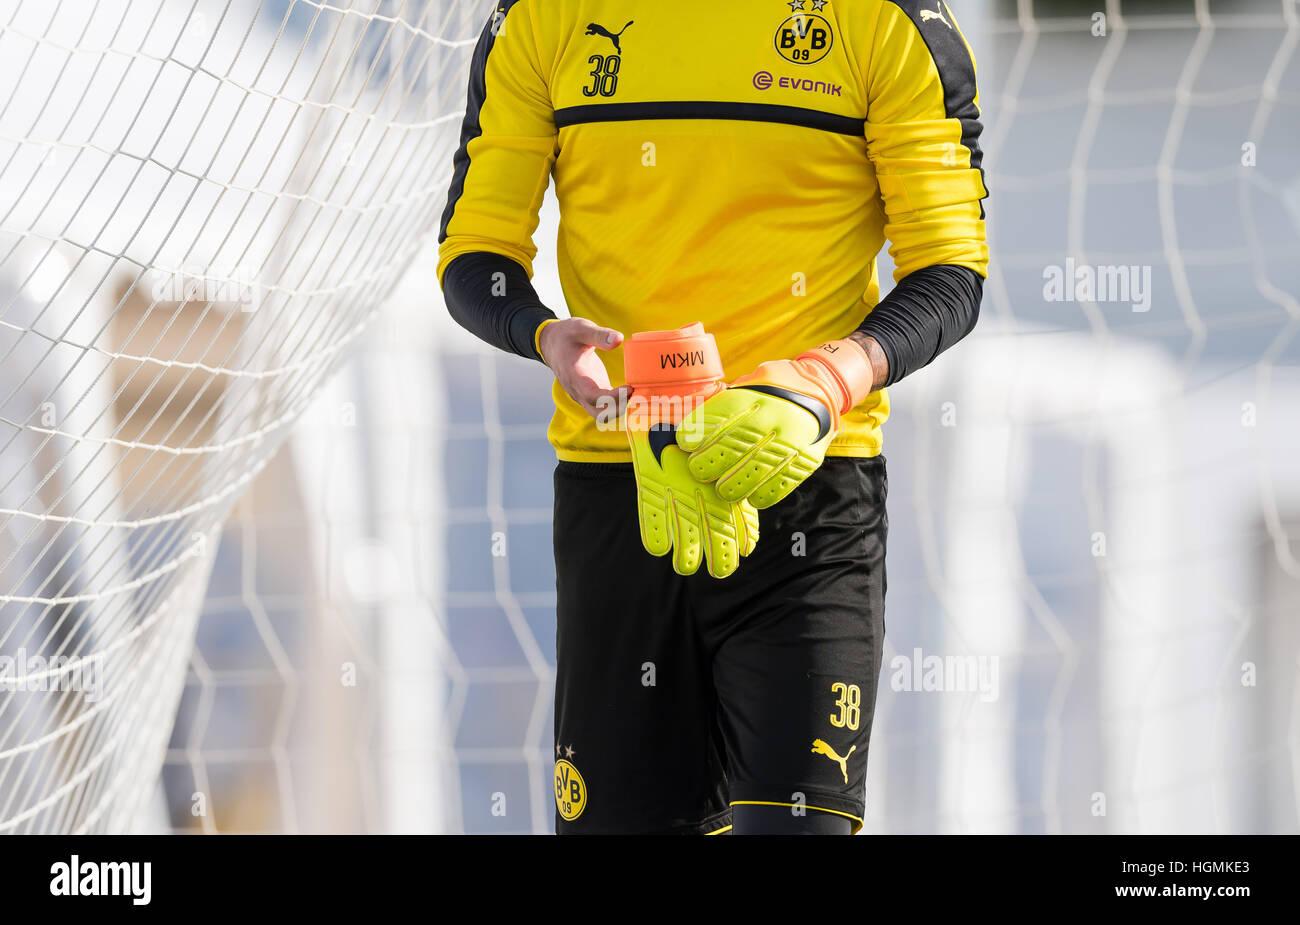 reputable site e3a0c 44978 Marbella, Spain. 11th Jan, 2017. Dortmund goalkeeper Roman ...